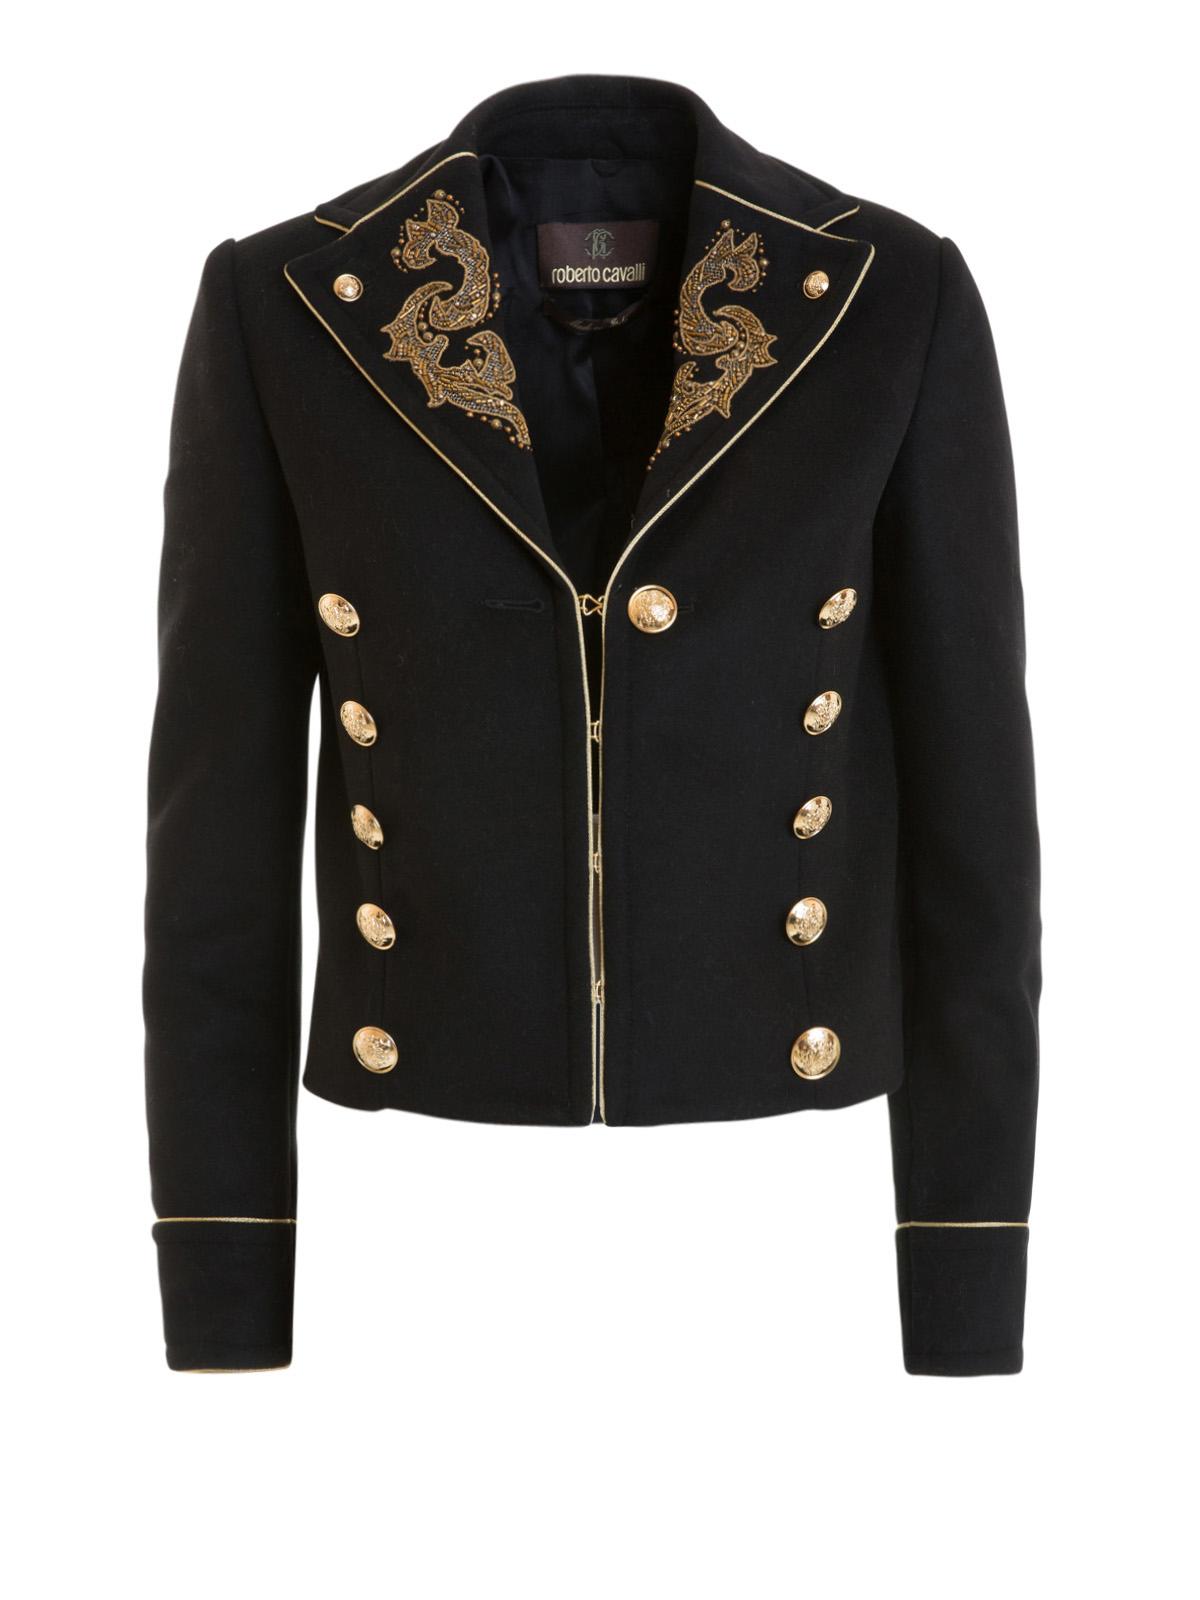 Golden arabesque embroidered jacket by roberto cavalli